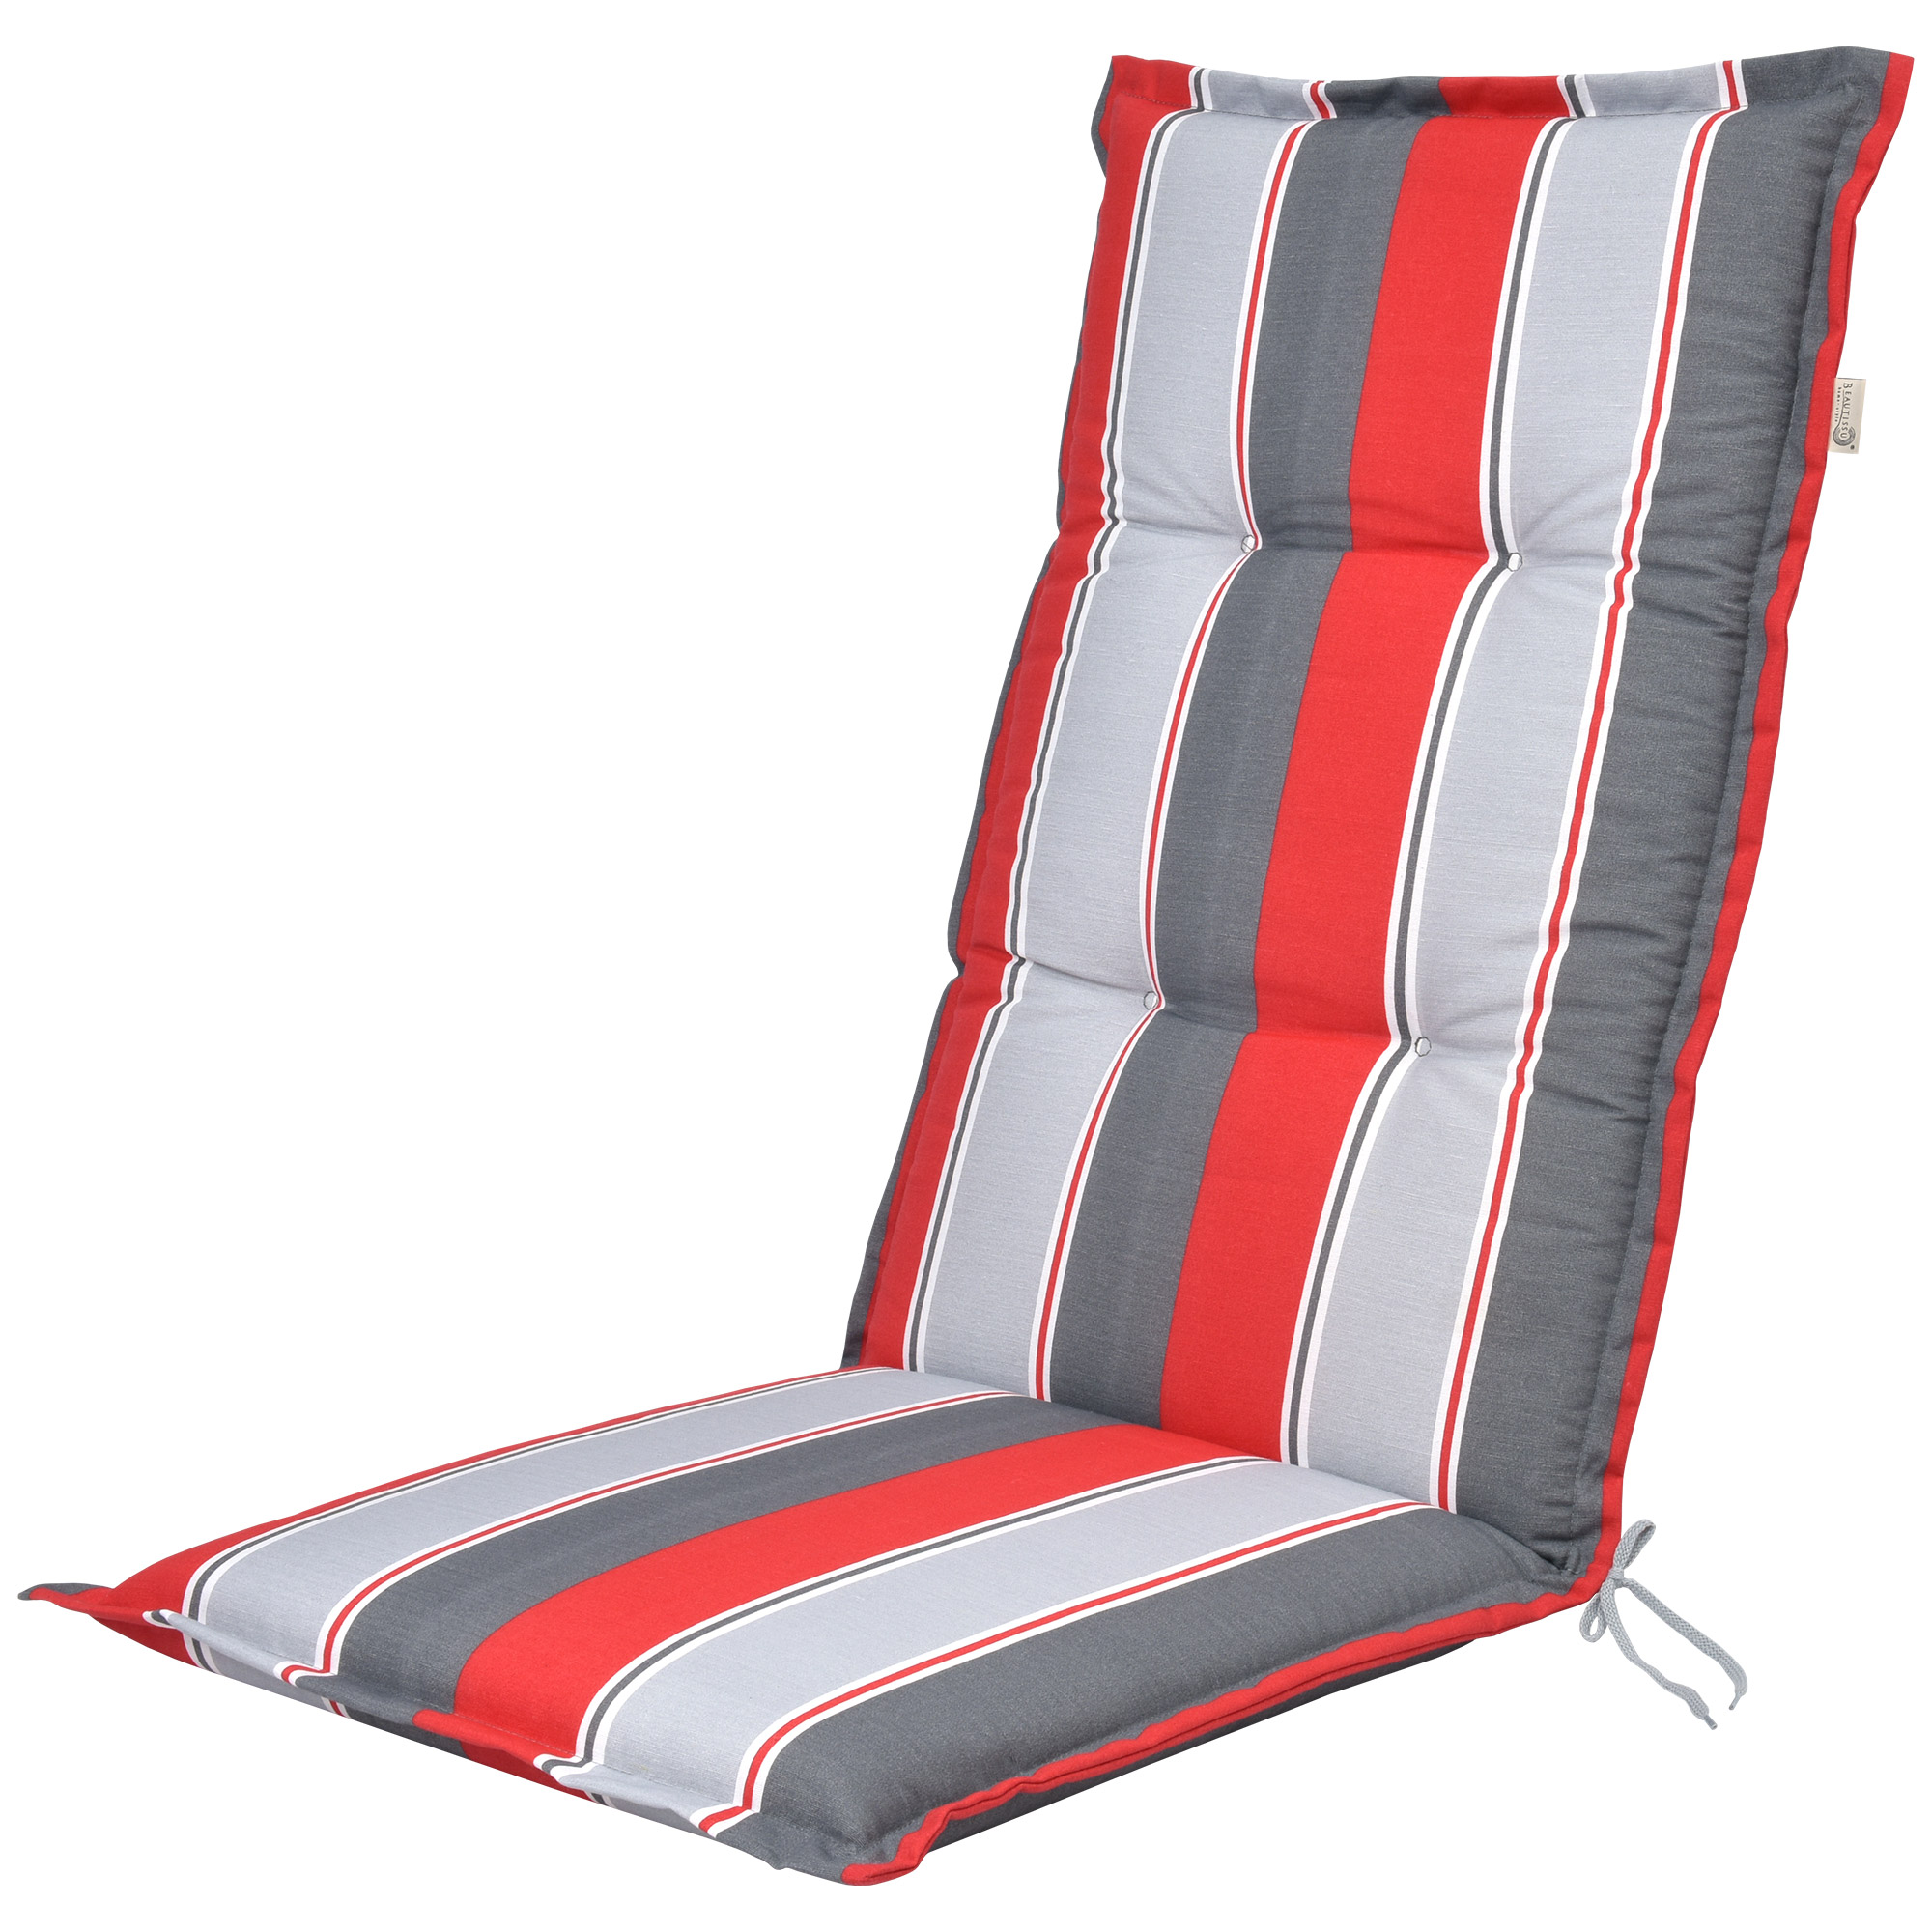 Auflage Hochlehner Stuhlauflagen Stapelstuhl Gartenstuhl